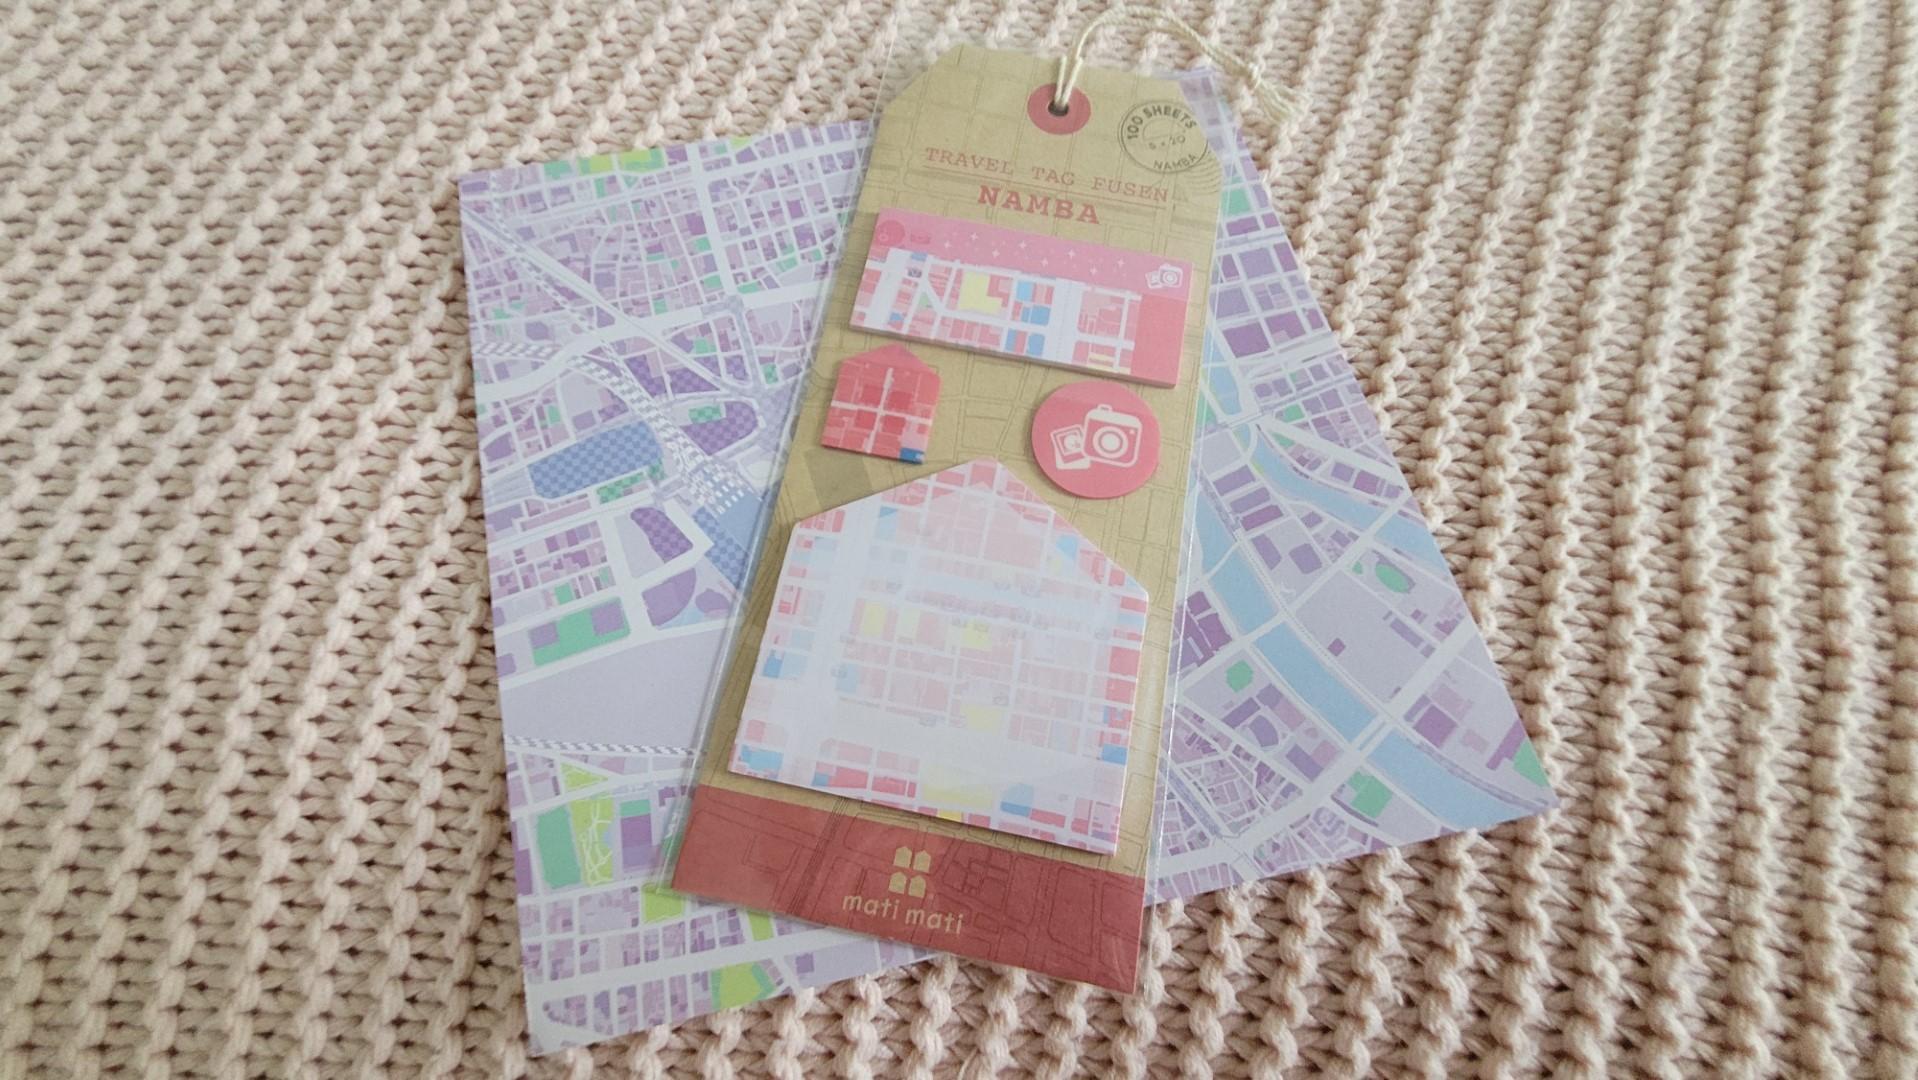 zenpop pack papeterie japonaise fevrier neon pastel notes adhesives travel tag Namba mati mati